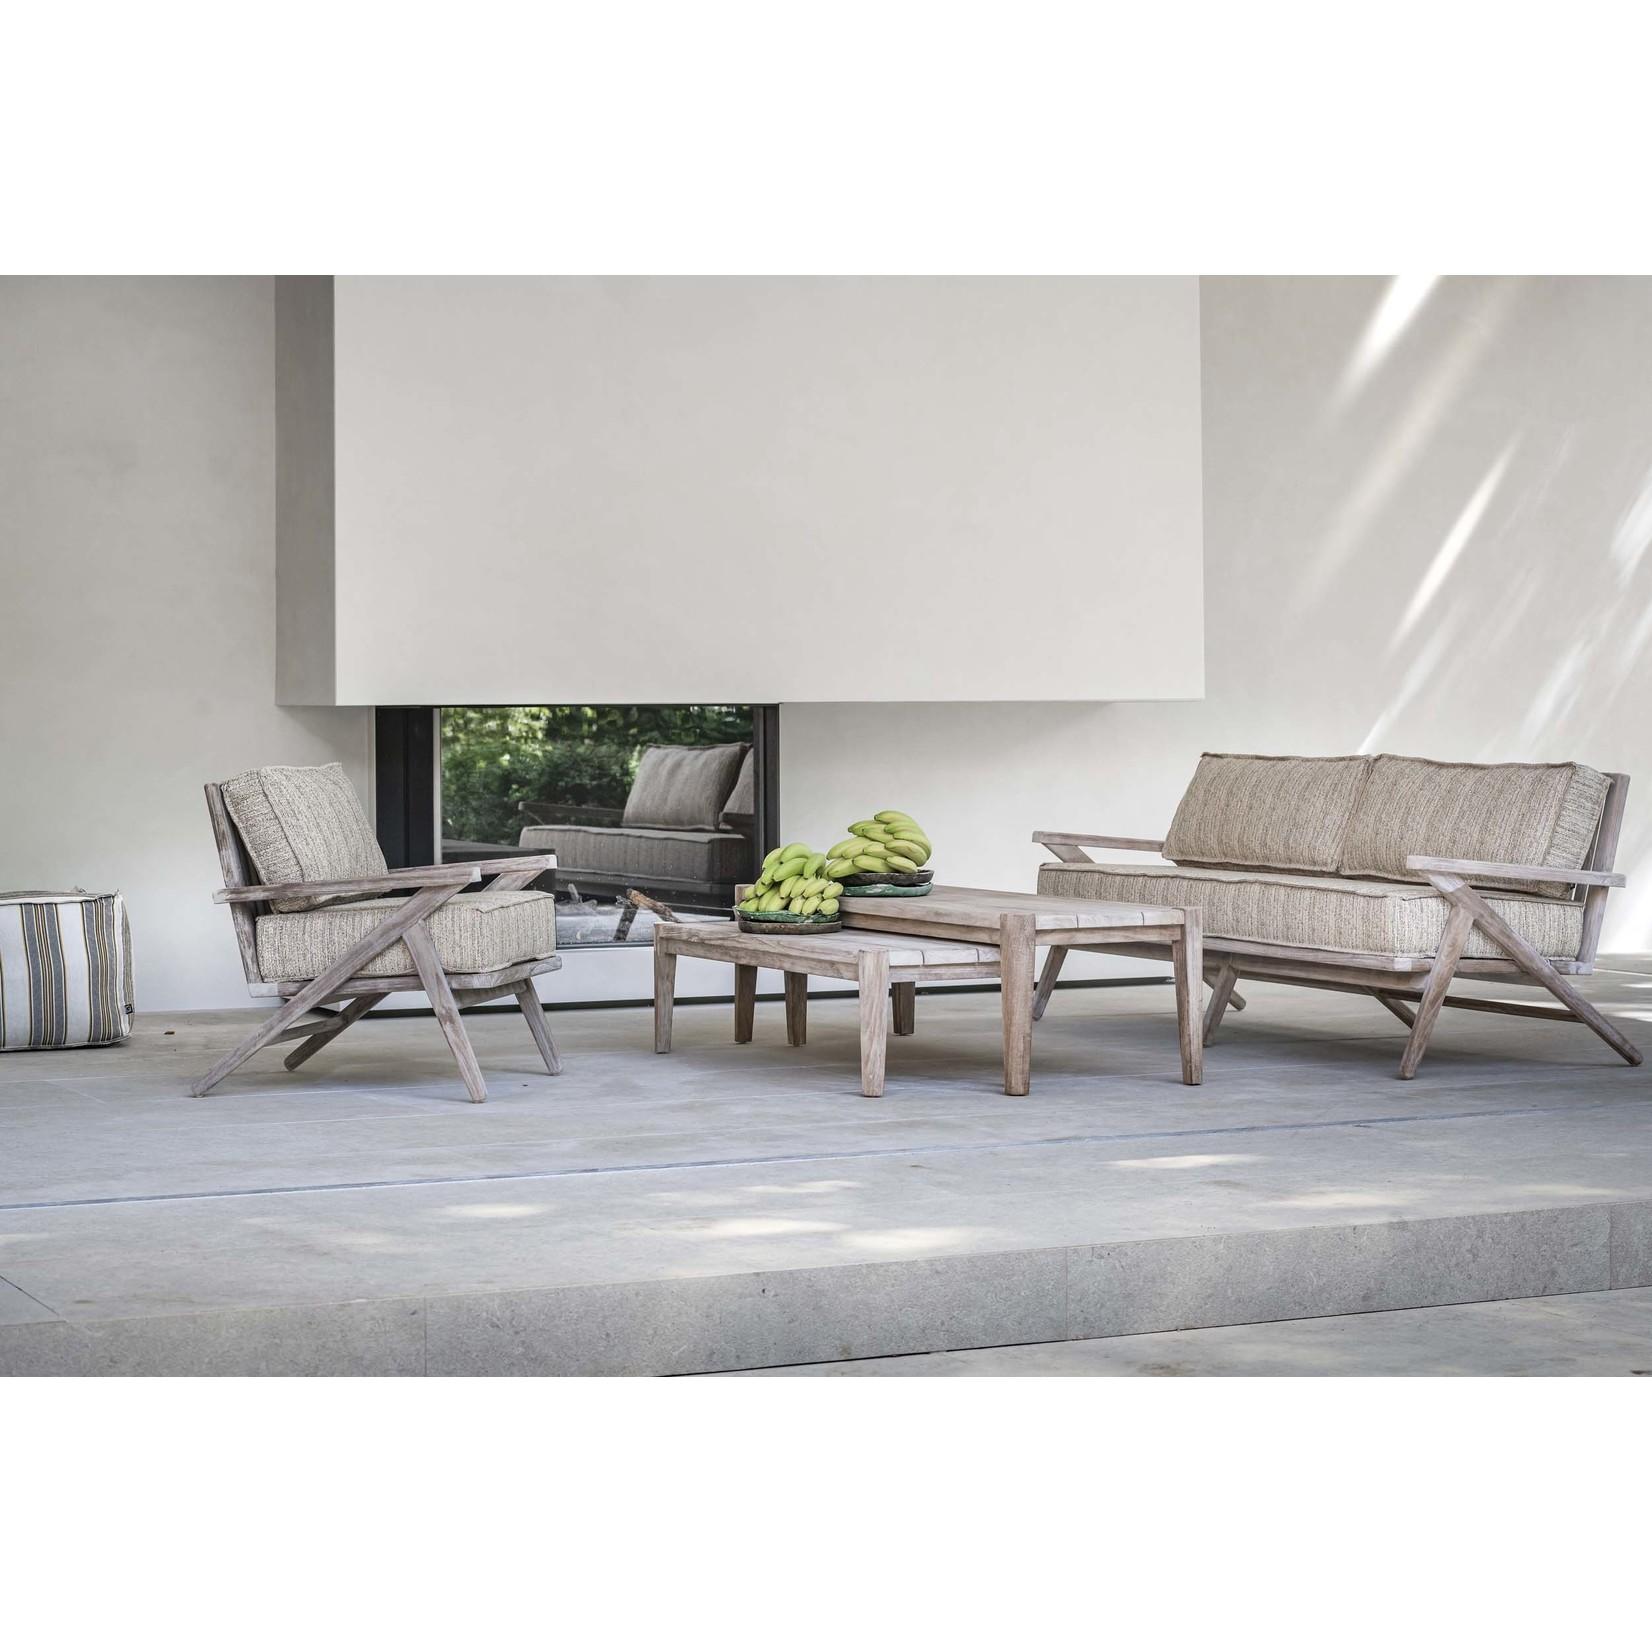 Gommaire 2.5-Seater Alabama | Teak Natural Gray + Cushion